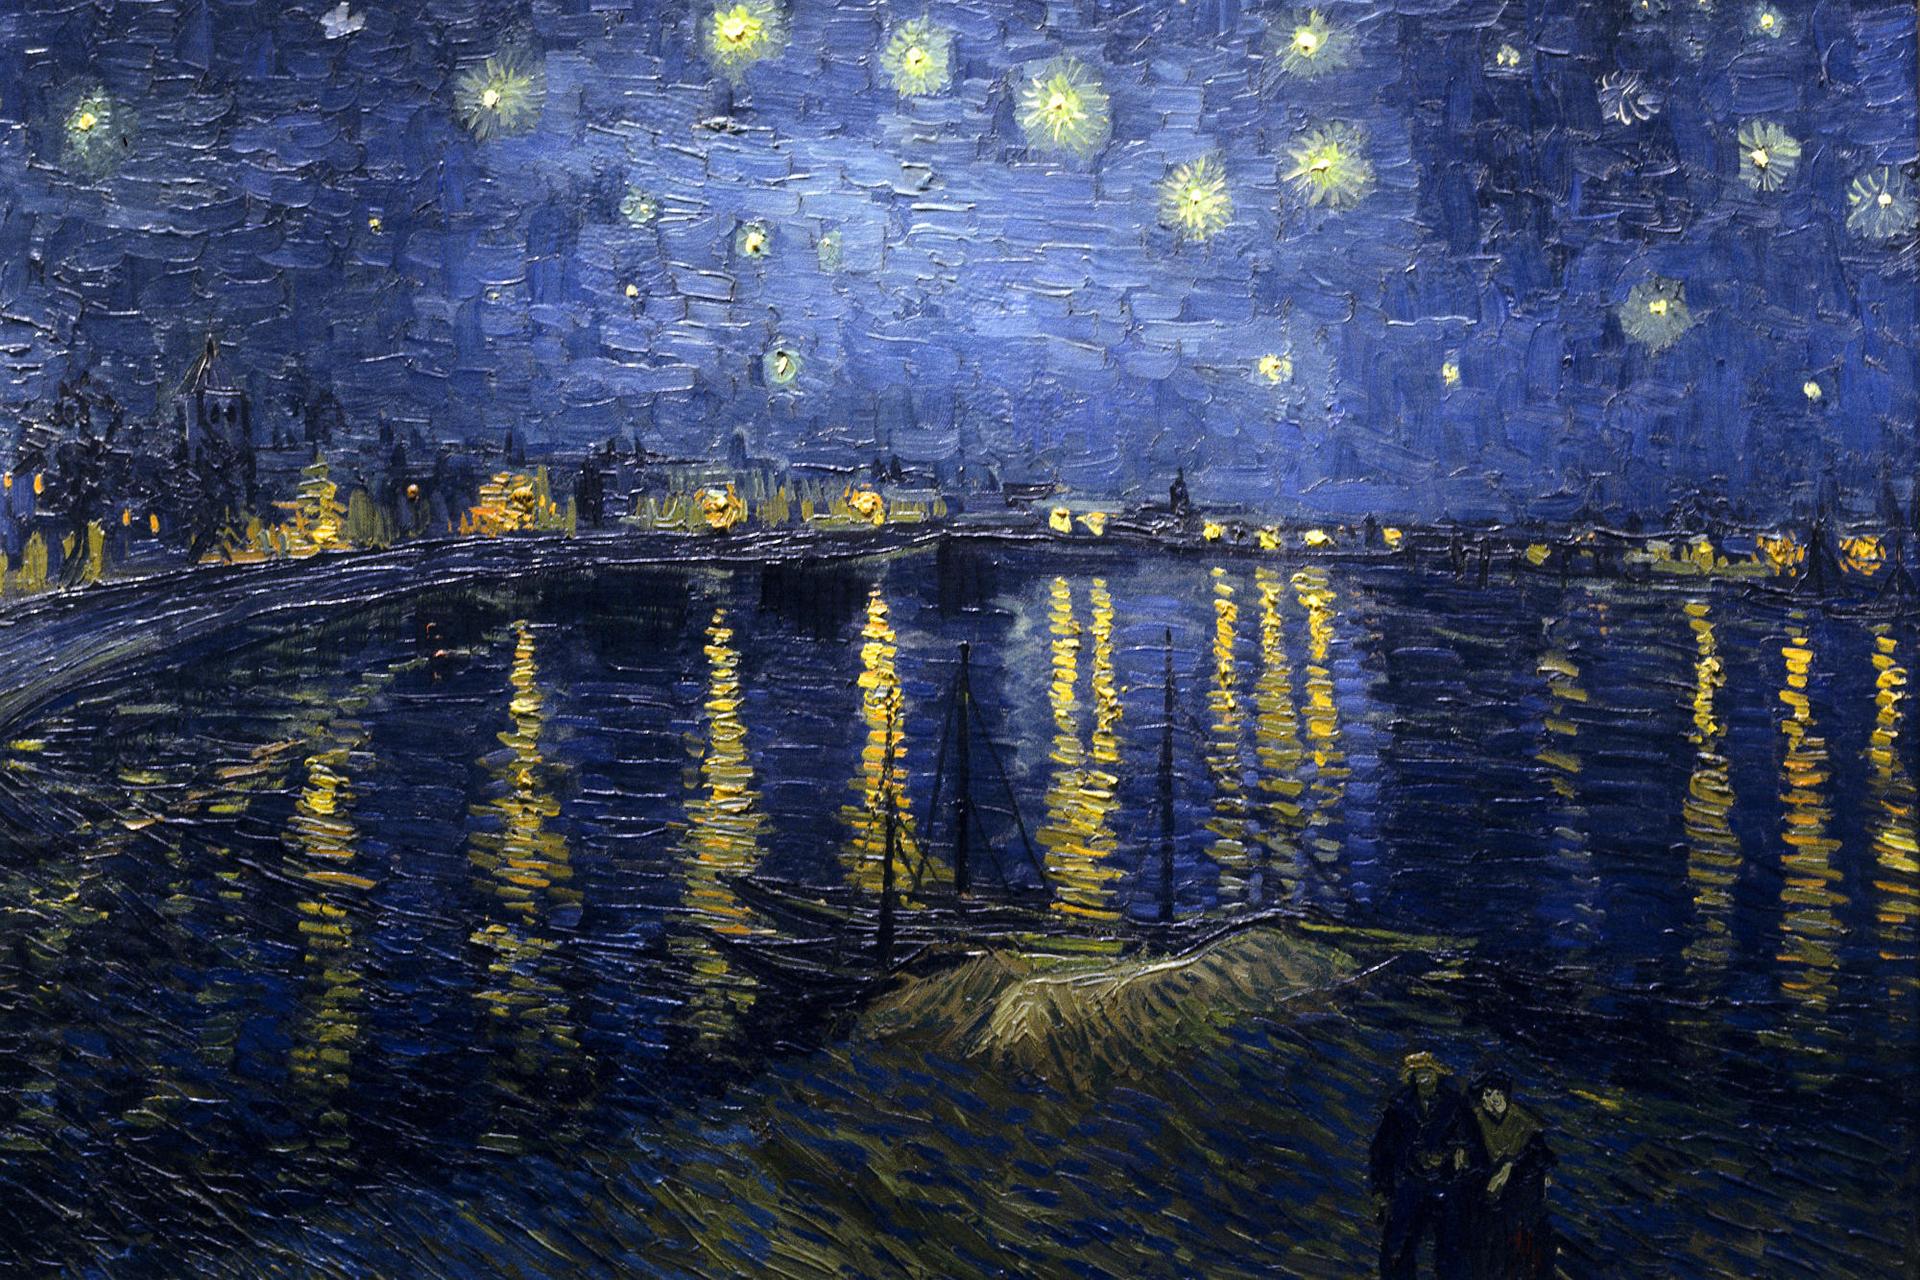 Original Van Gogh painting, Starry Night Over the Rhone